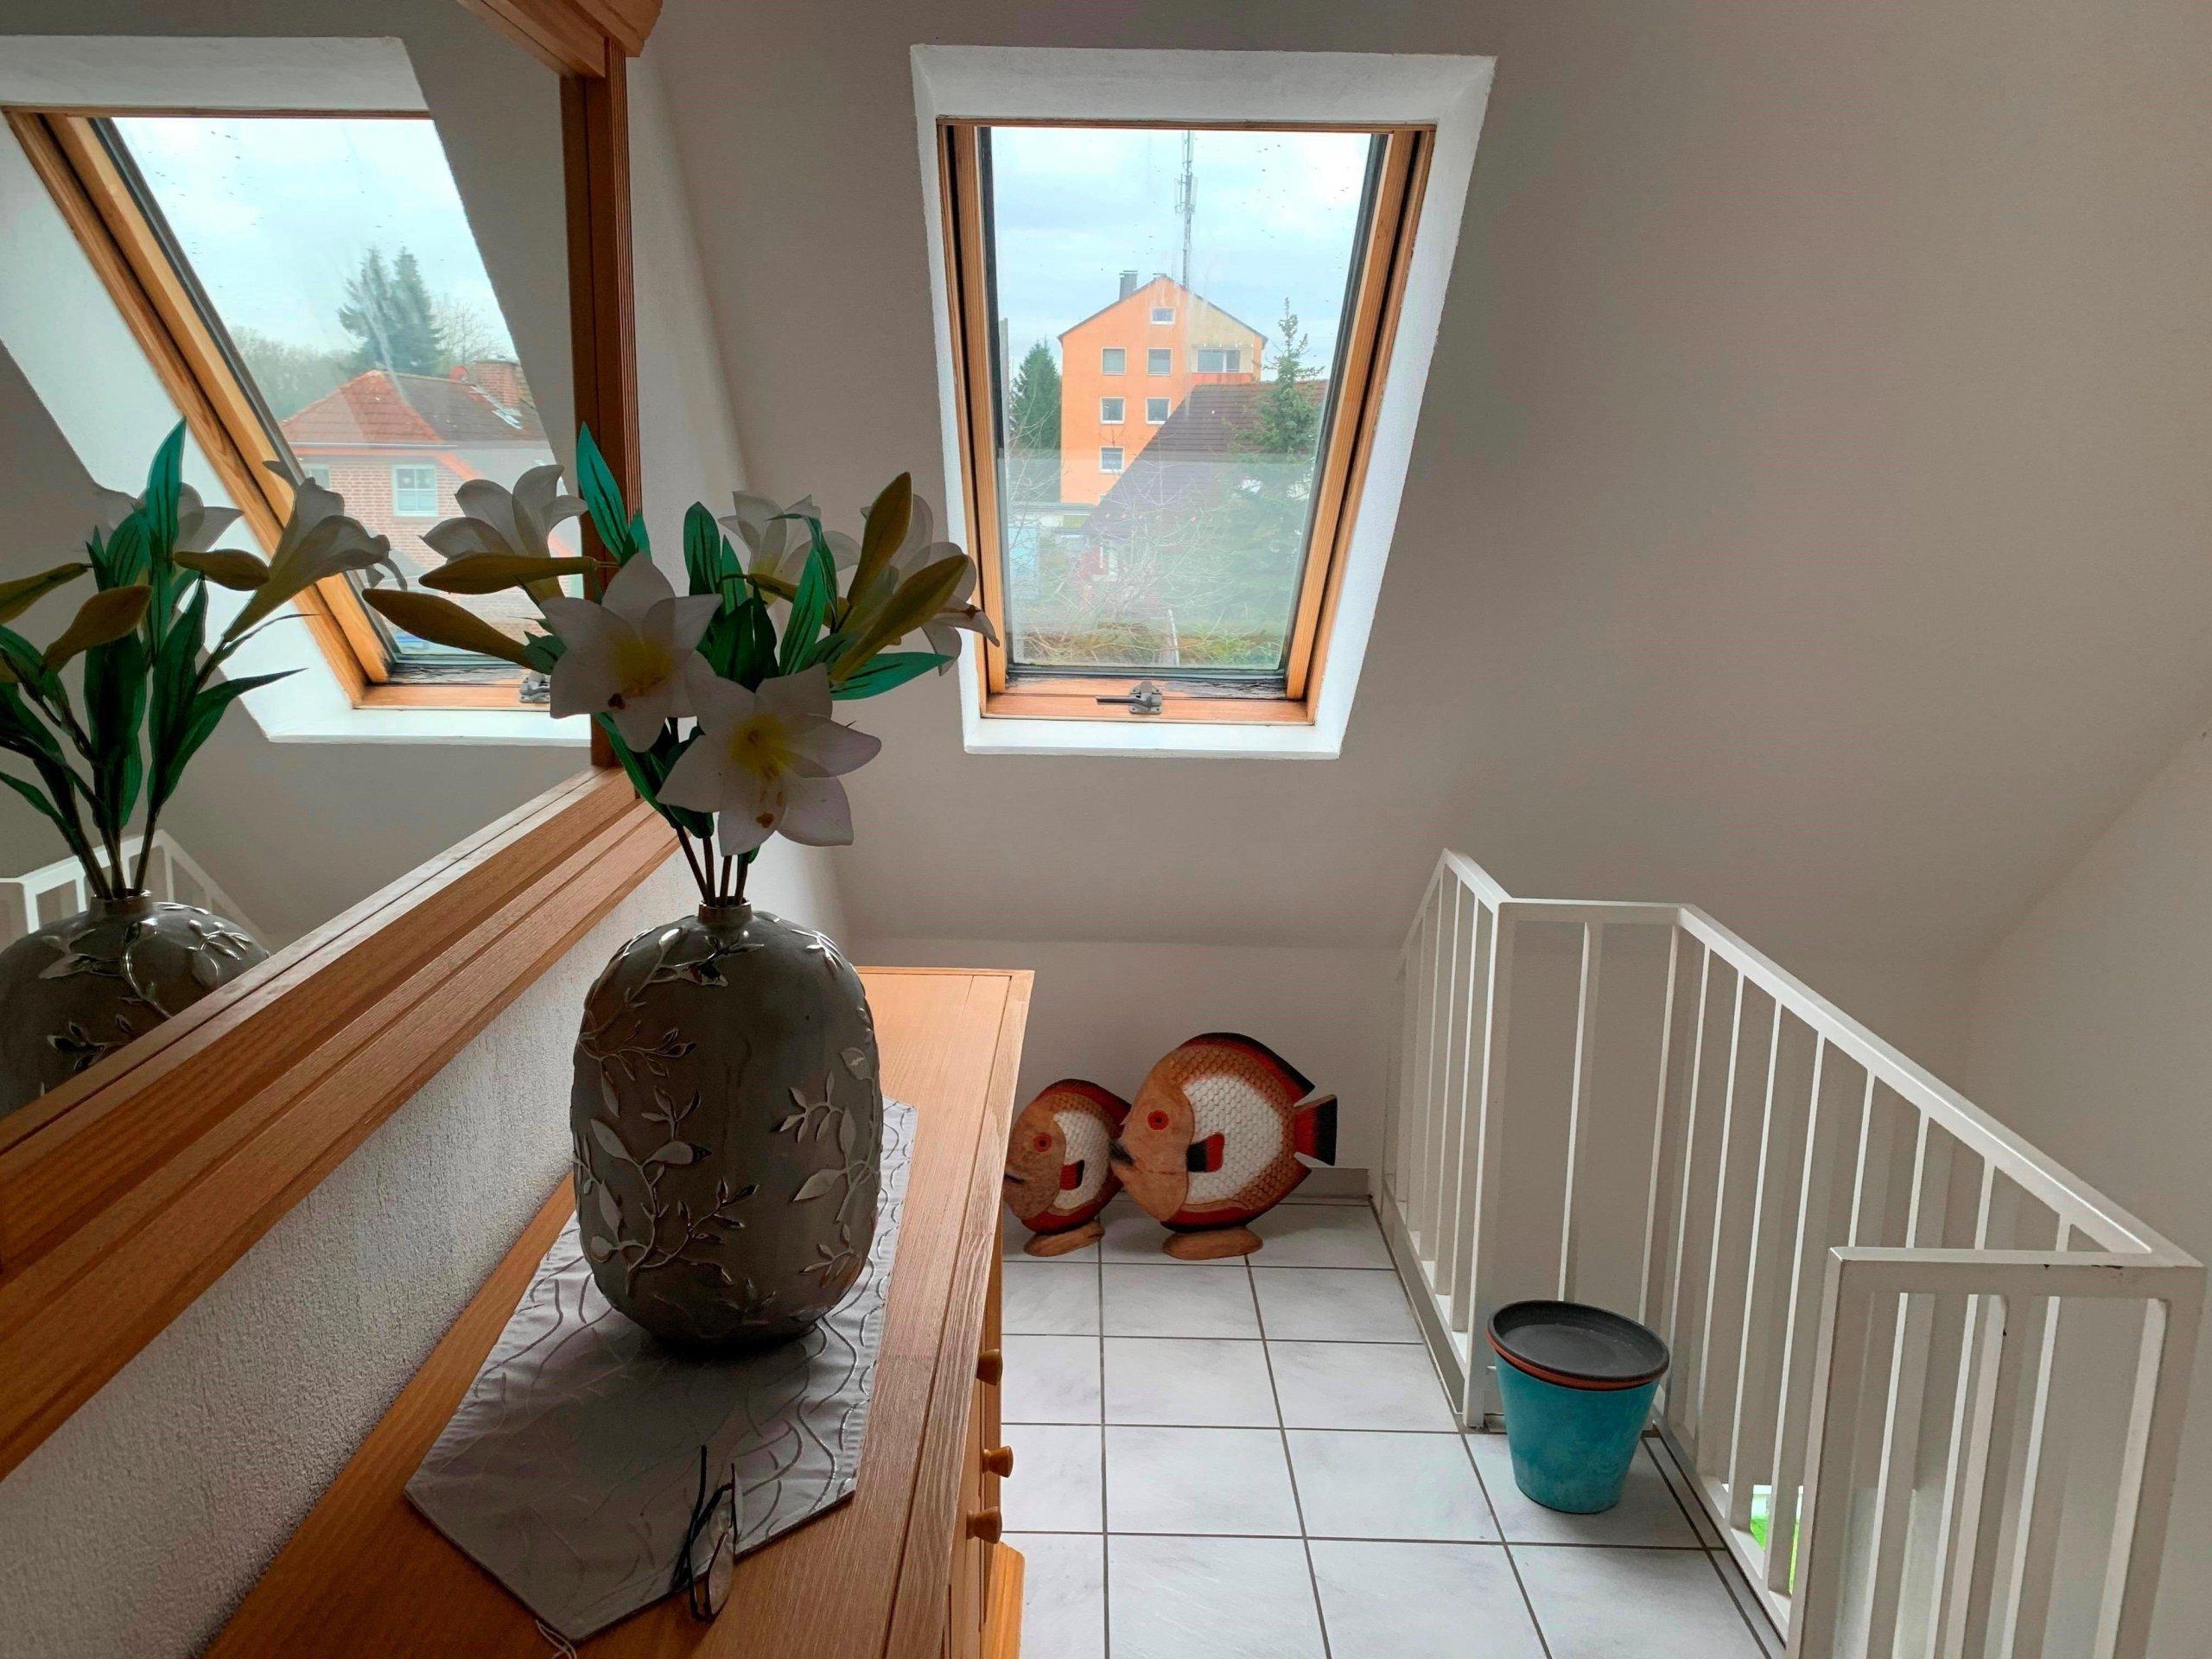 Castrop-Rauxel – Pöppinghausen 3-Familienhaus zur Kapitalanlage